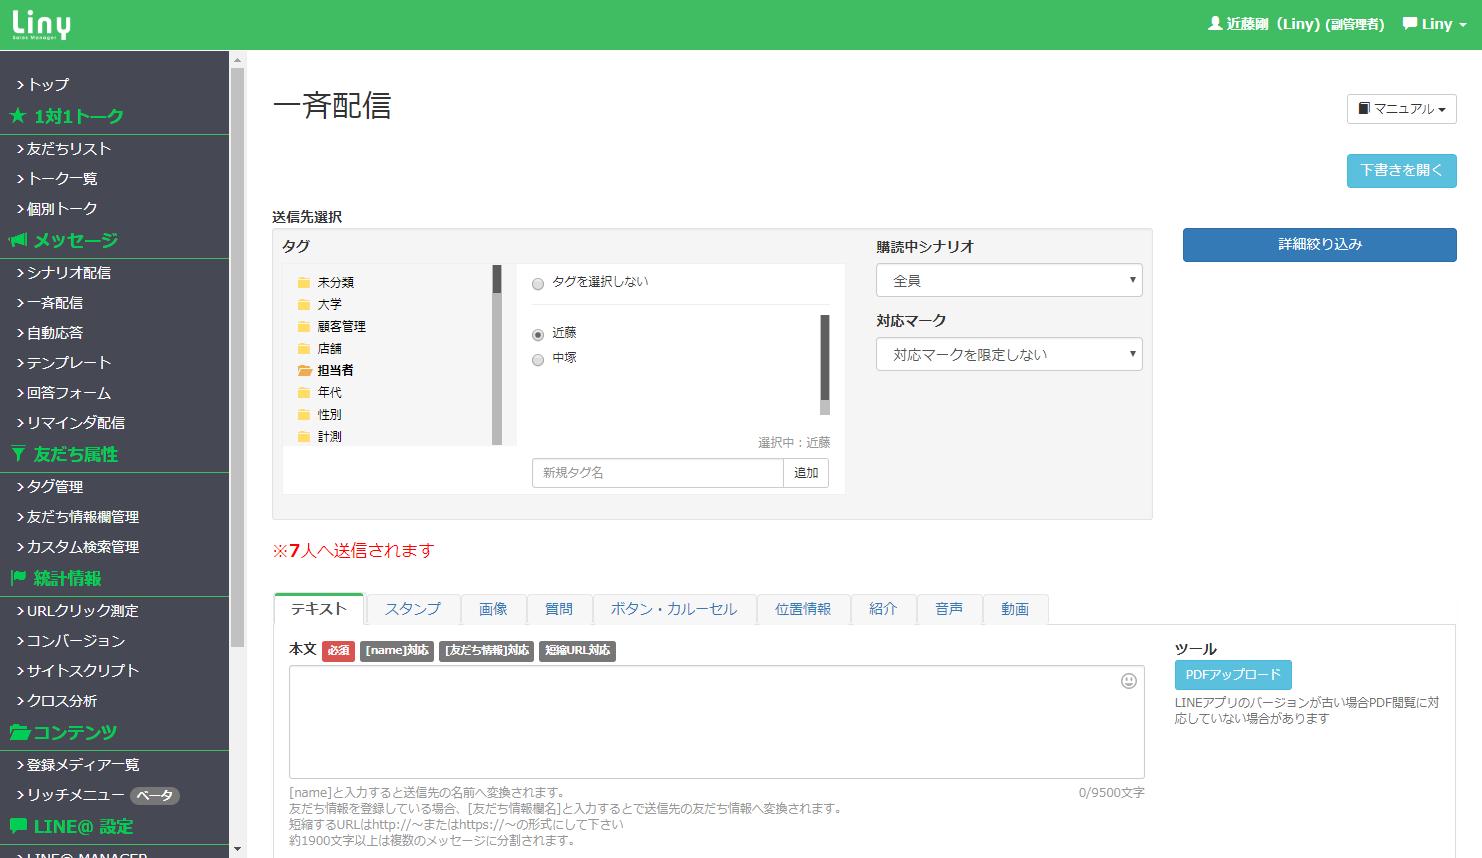 LINE@ 顧客管理